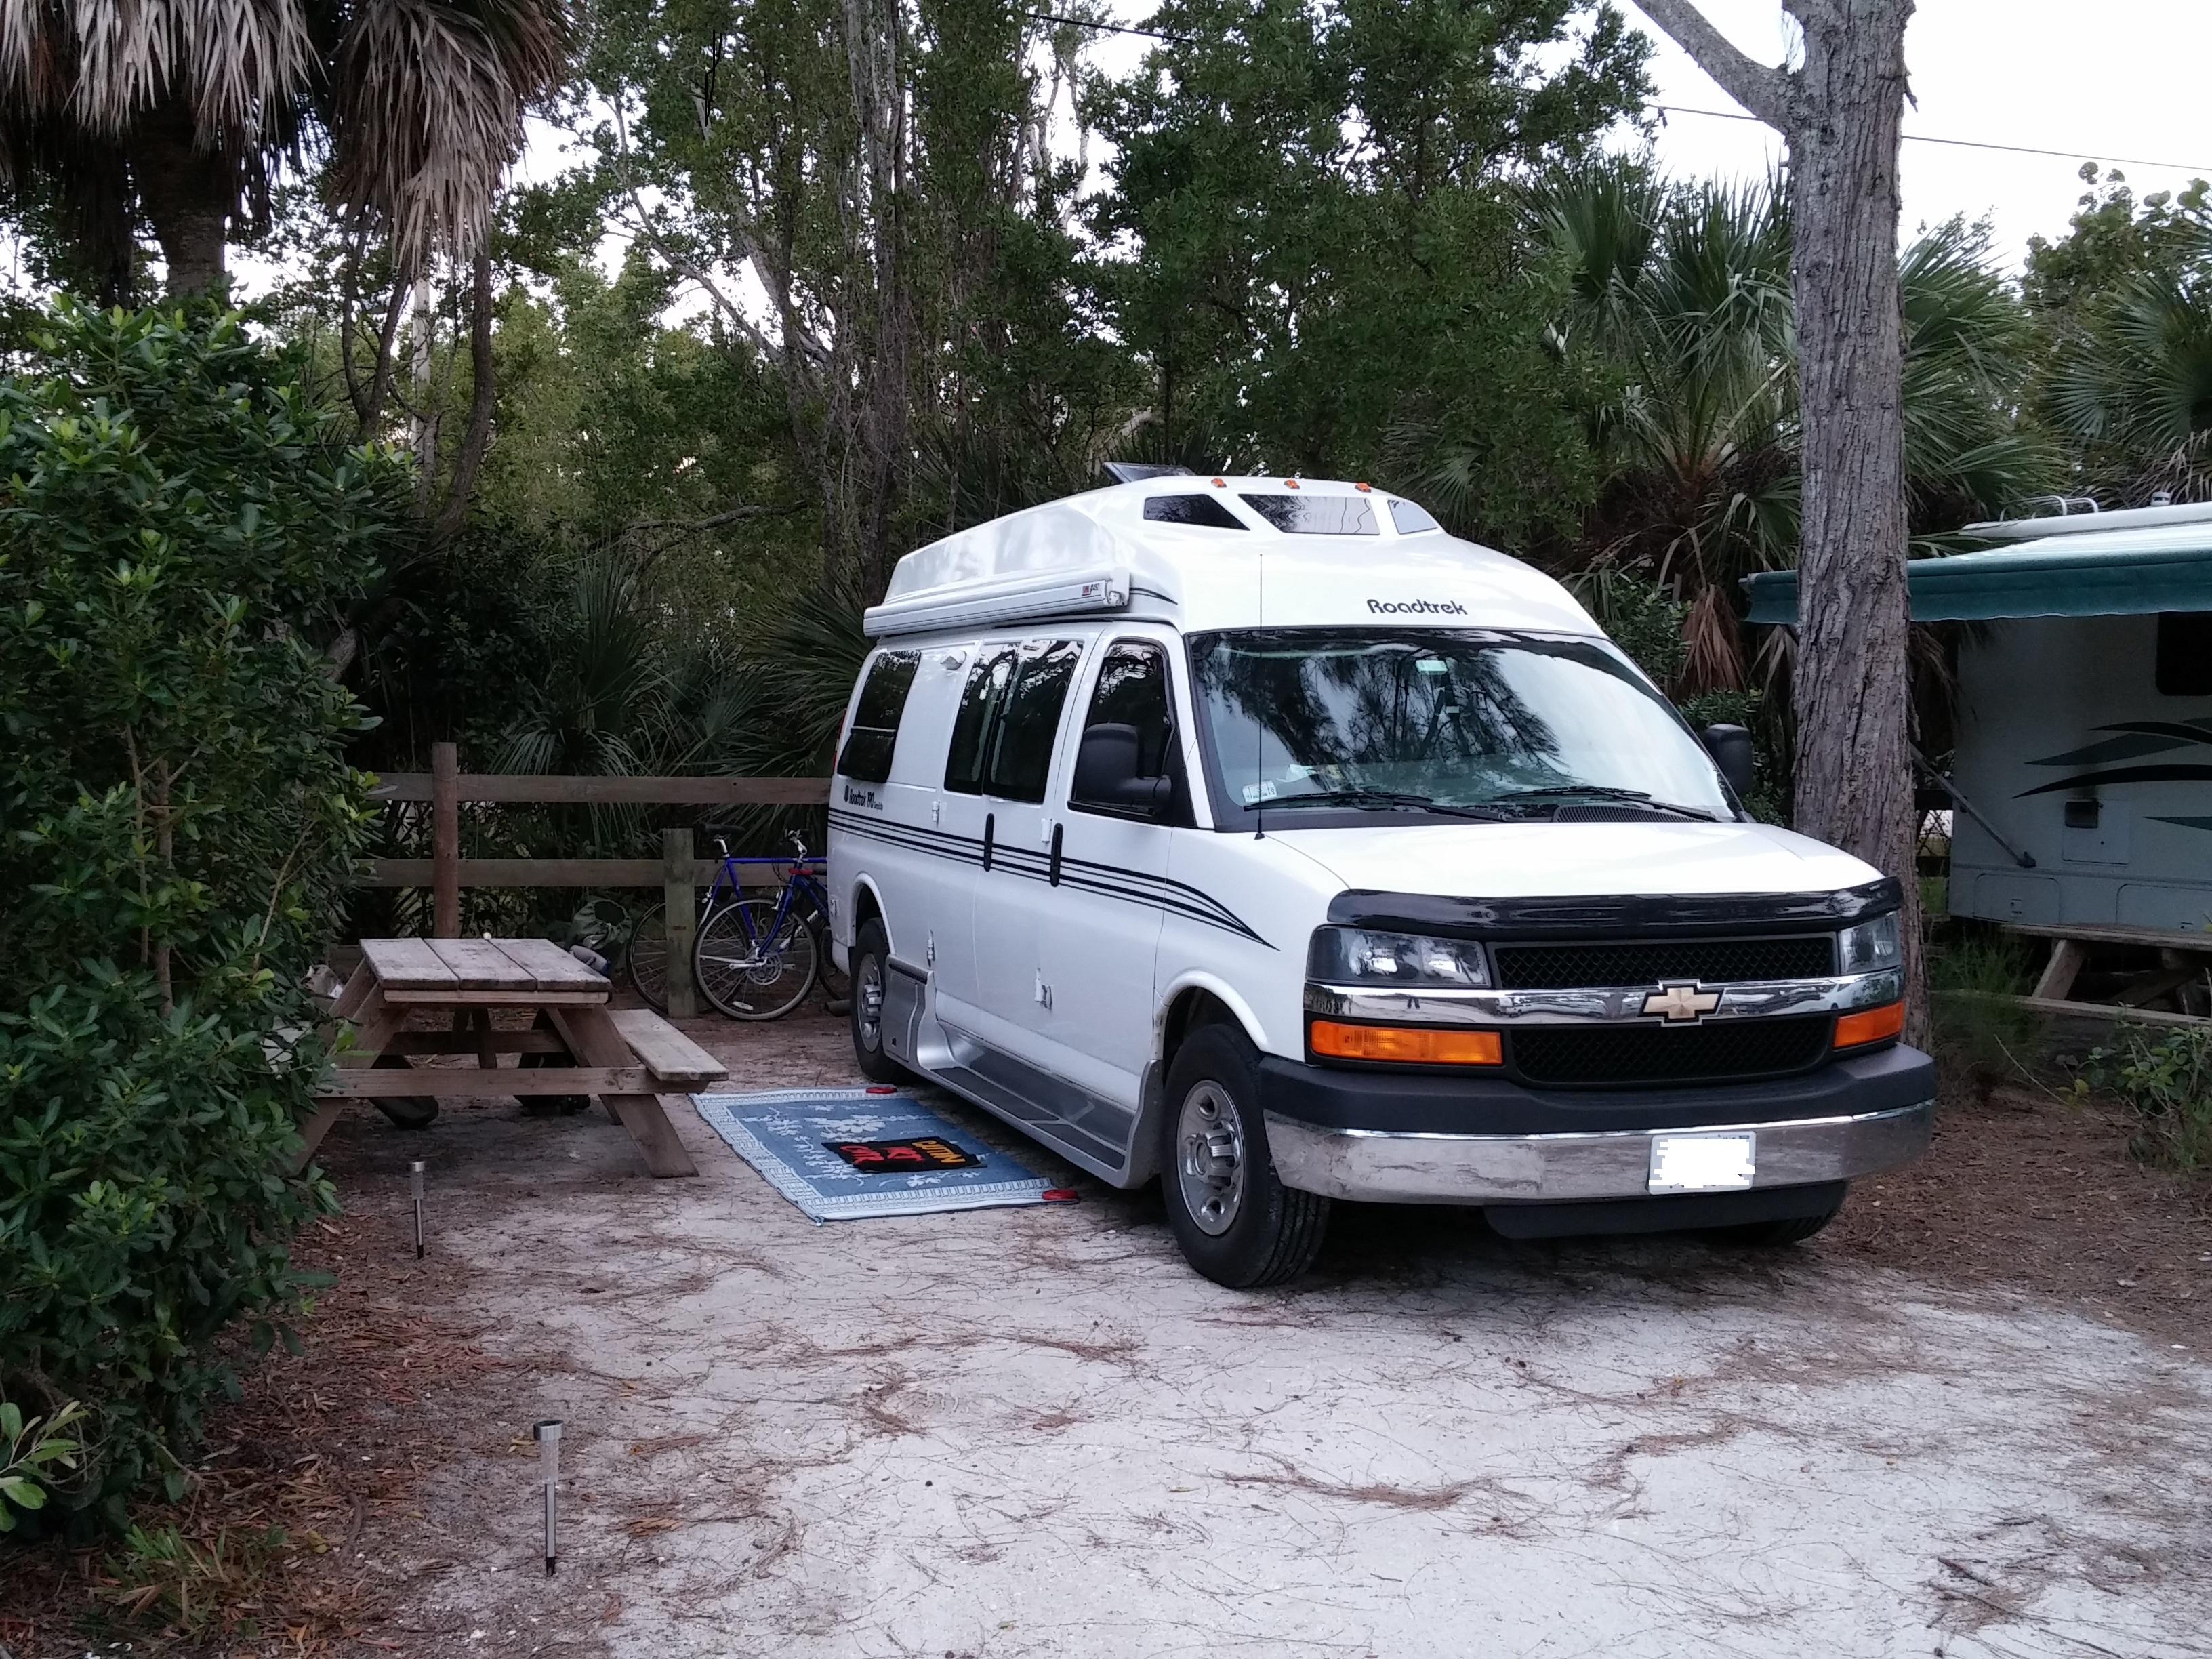 Sarasota RV Parks | Reviews and Photos @ RVParking.com on rv parks sarasota fl, marinas sarasota fl, mobile home parks san jose ca, gated communities sarasota fl, mobile home parks tulsa ok, apartments sarasota fl,